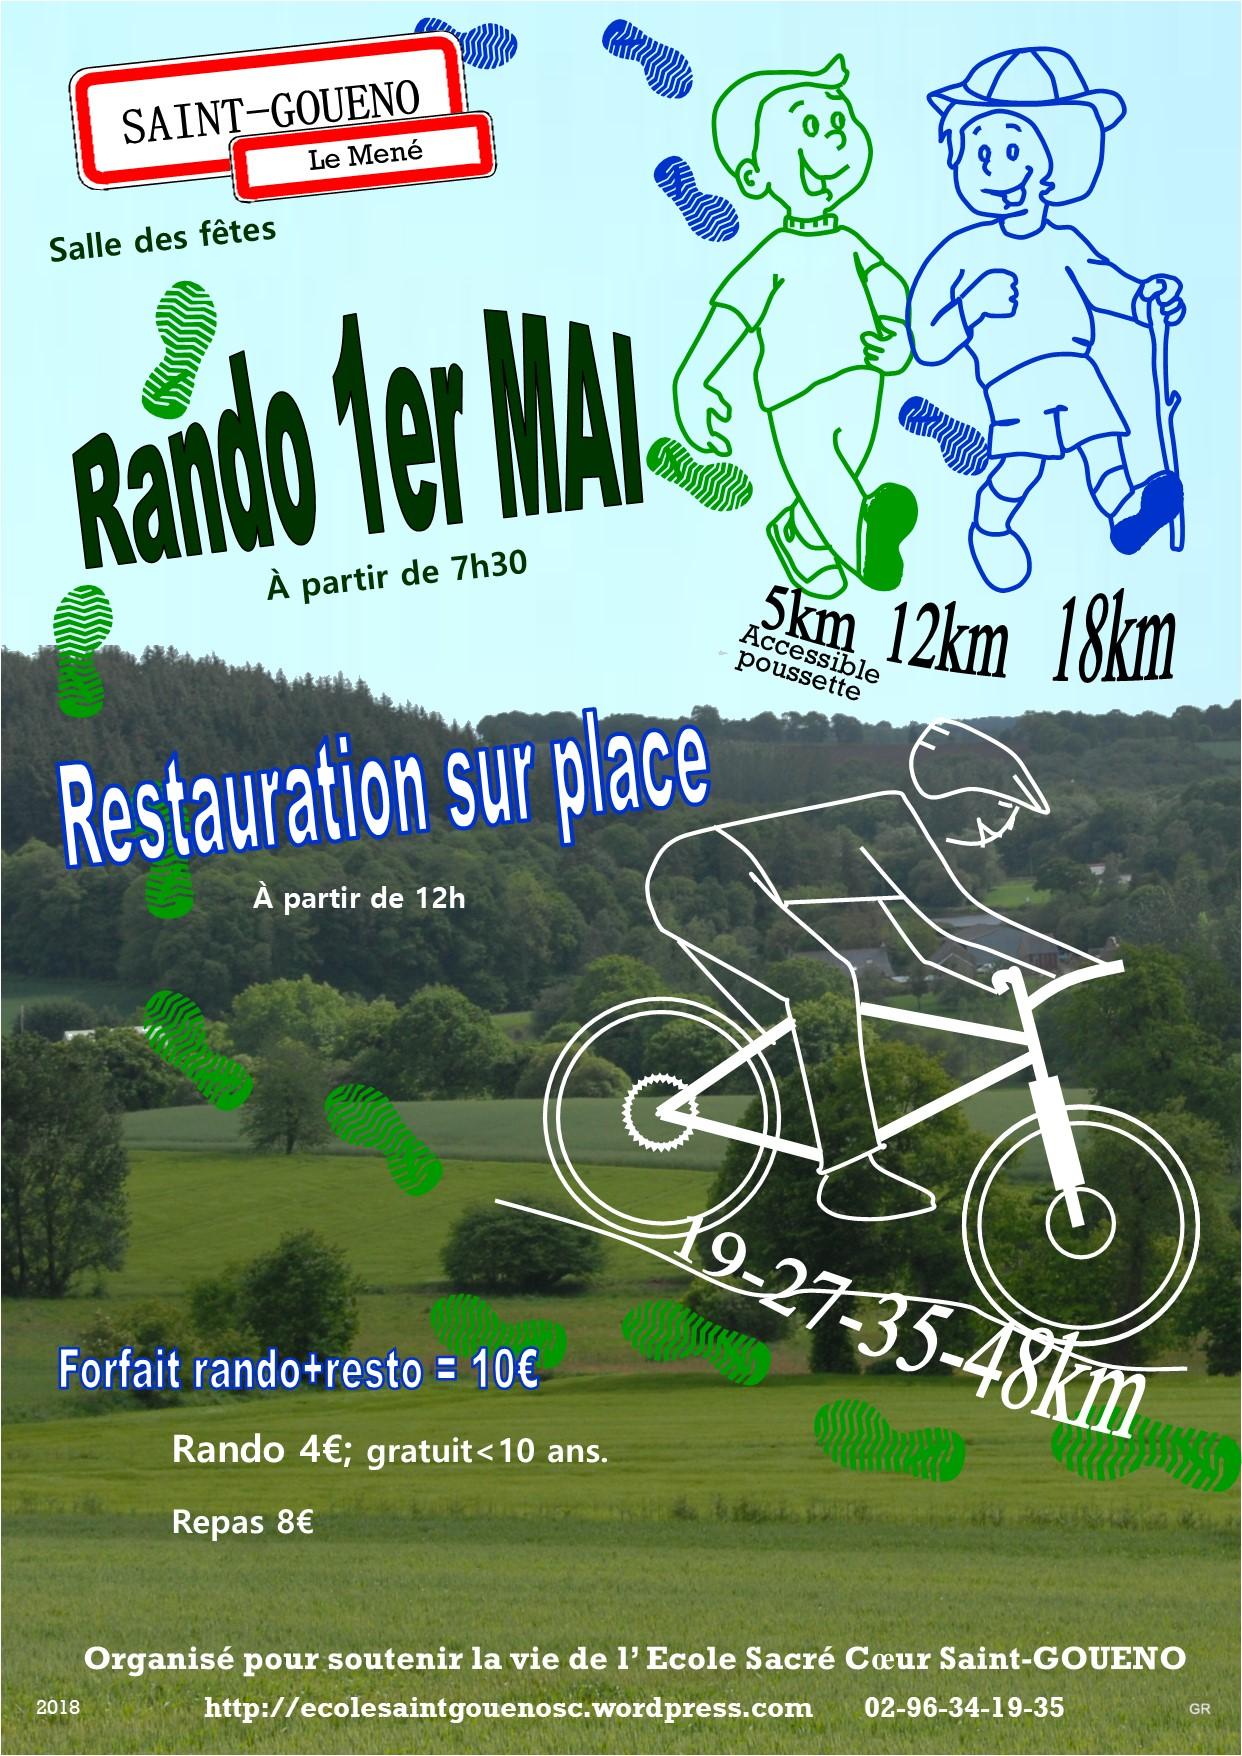 rando 1er Mai Saint Goueno 2018